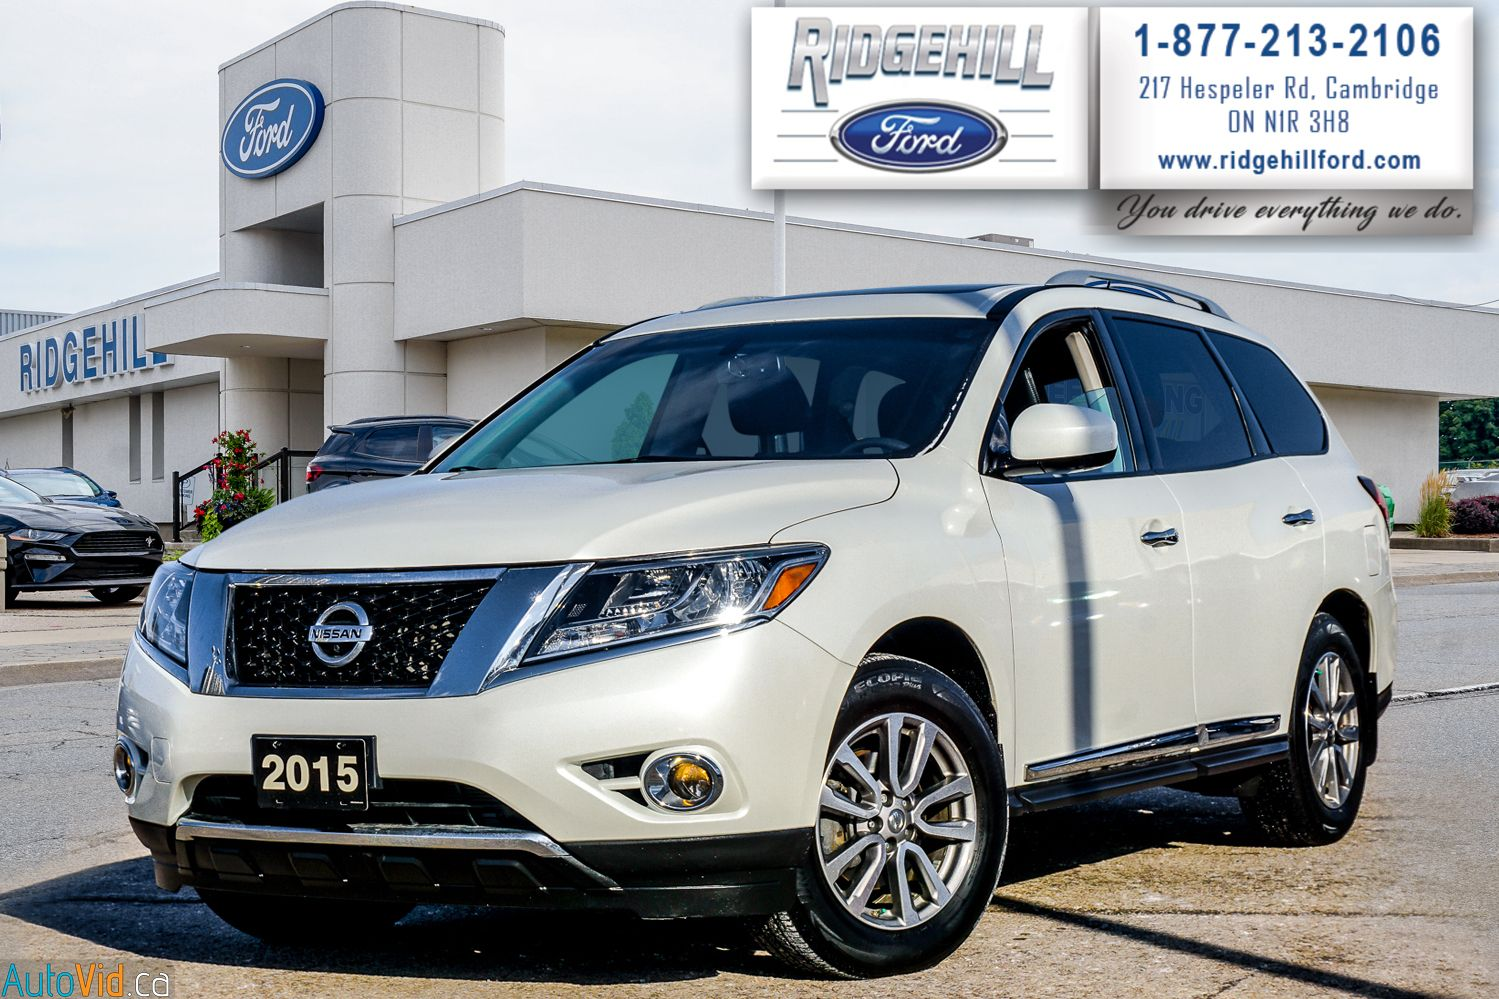 2015 Nissan Pathfinder Image